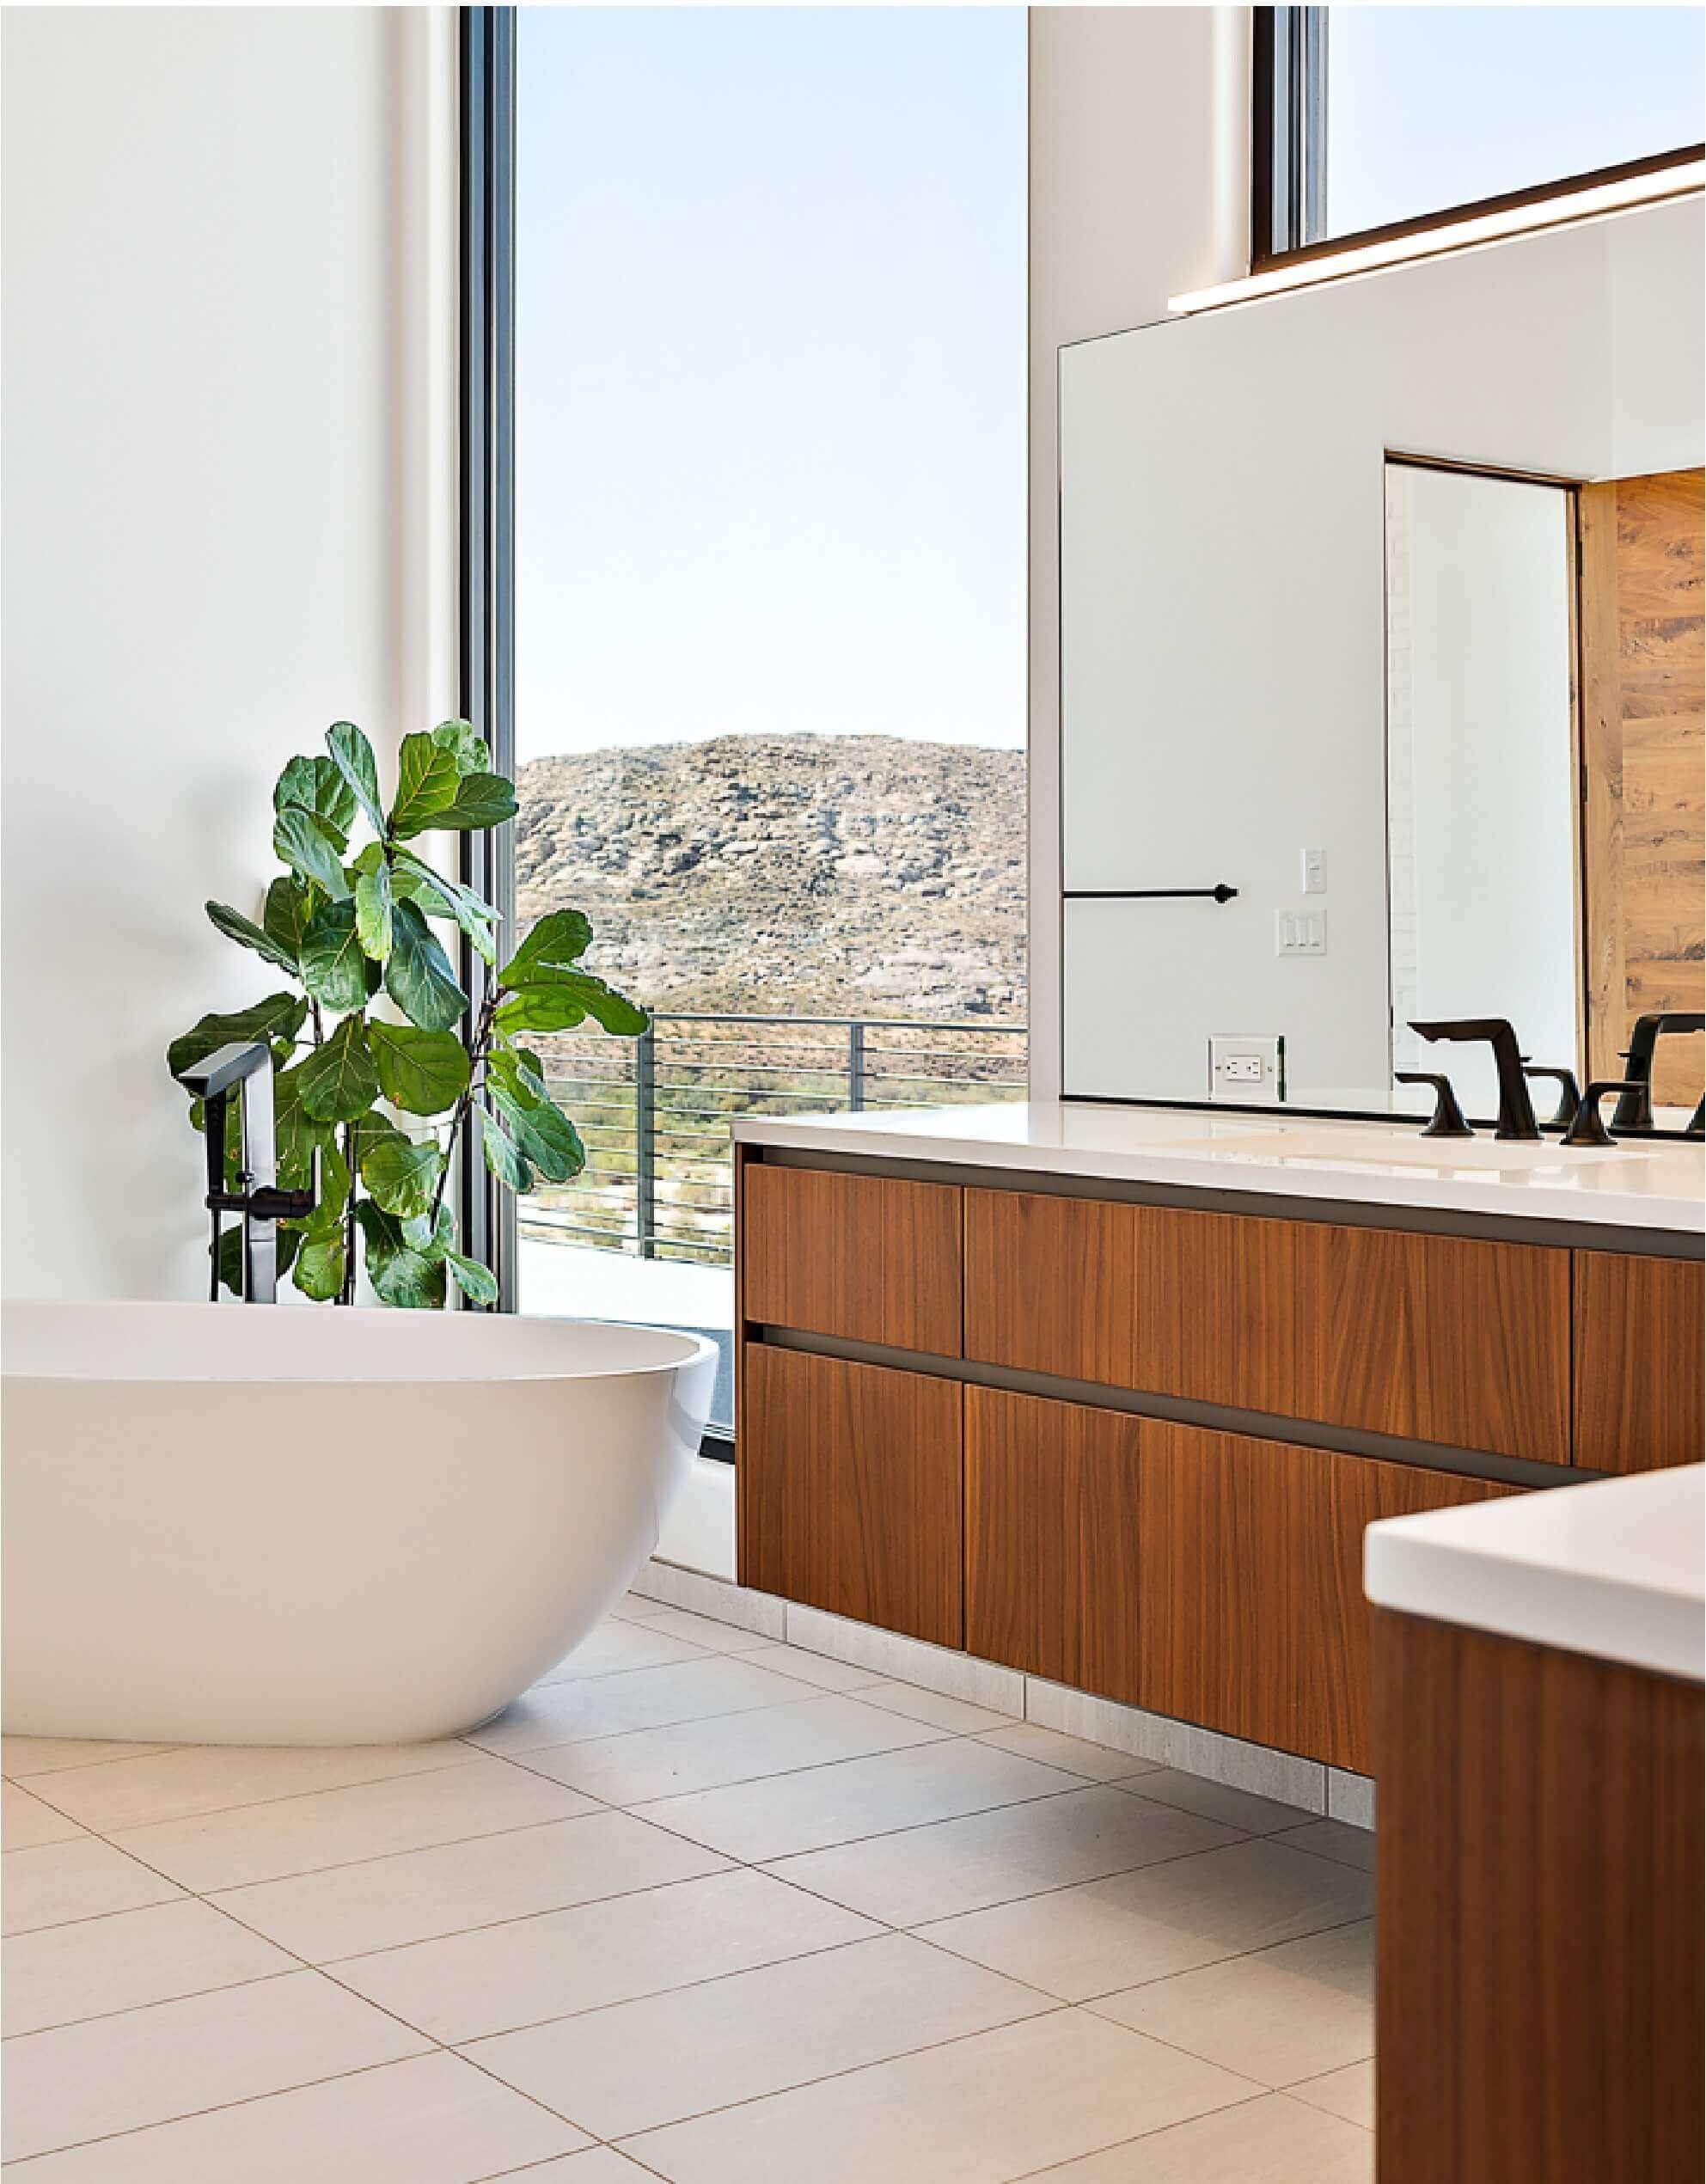 St. George Home Design Bathroom With Large Windows